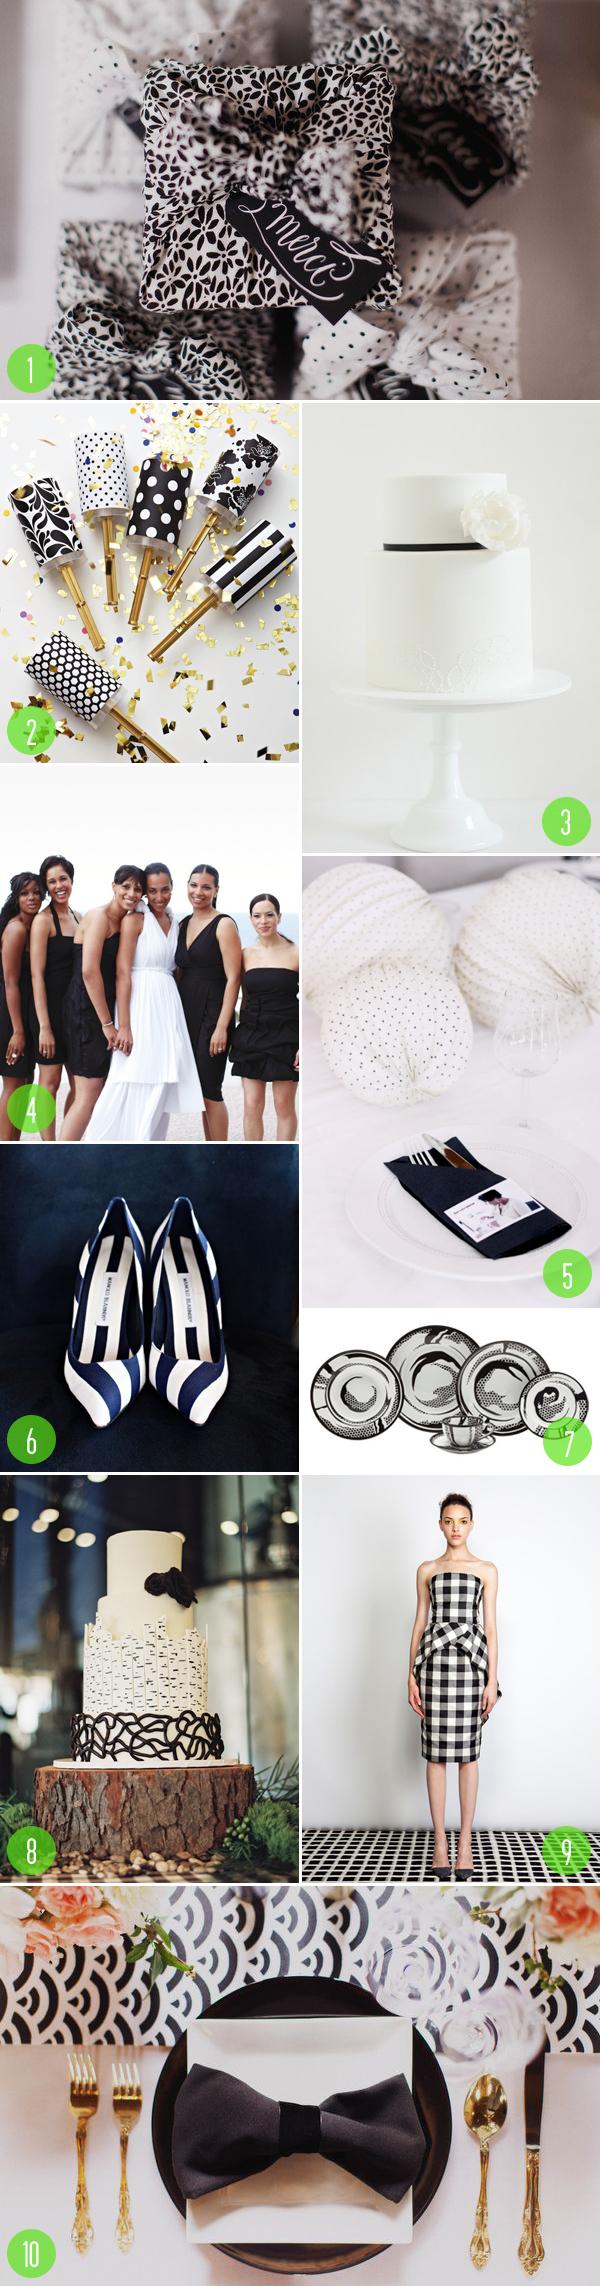 top 10: black & white details 2